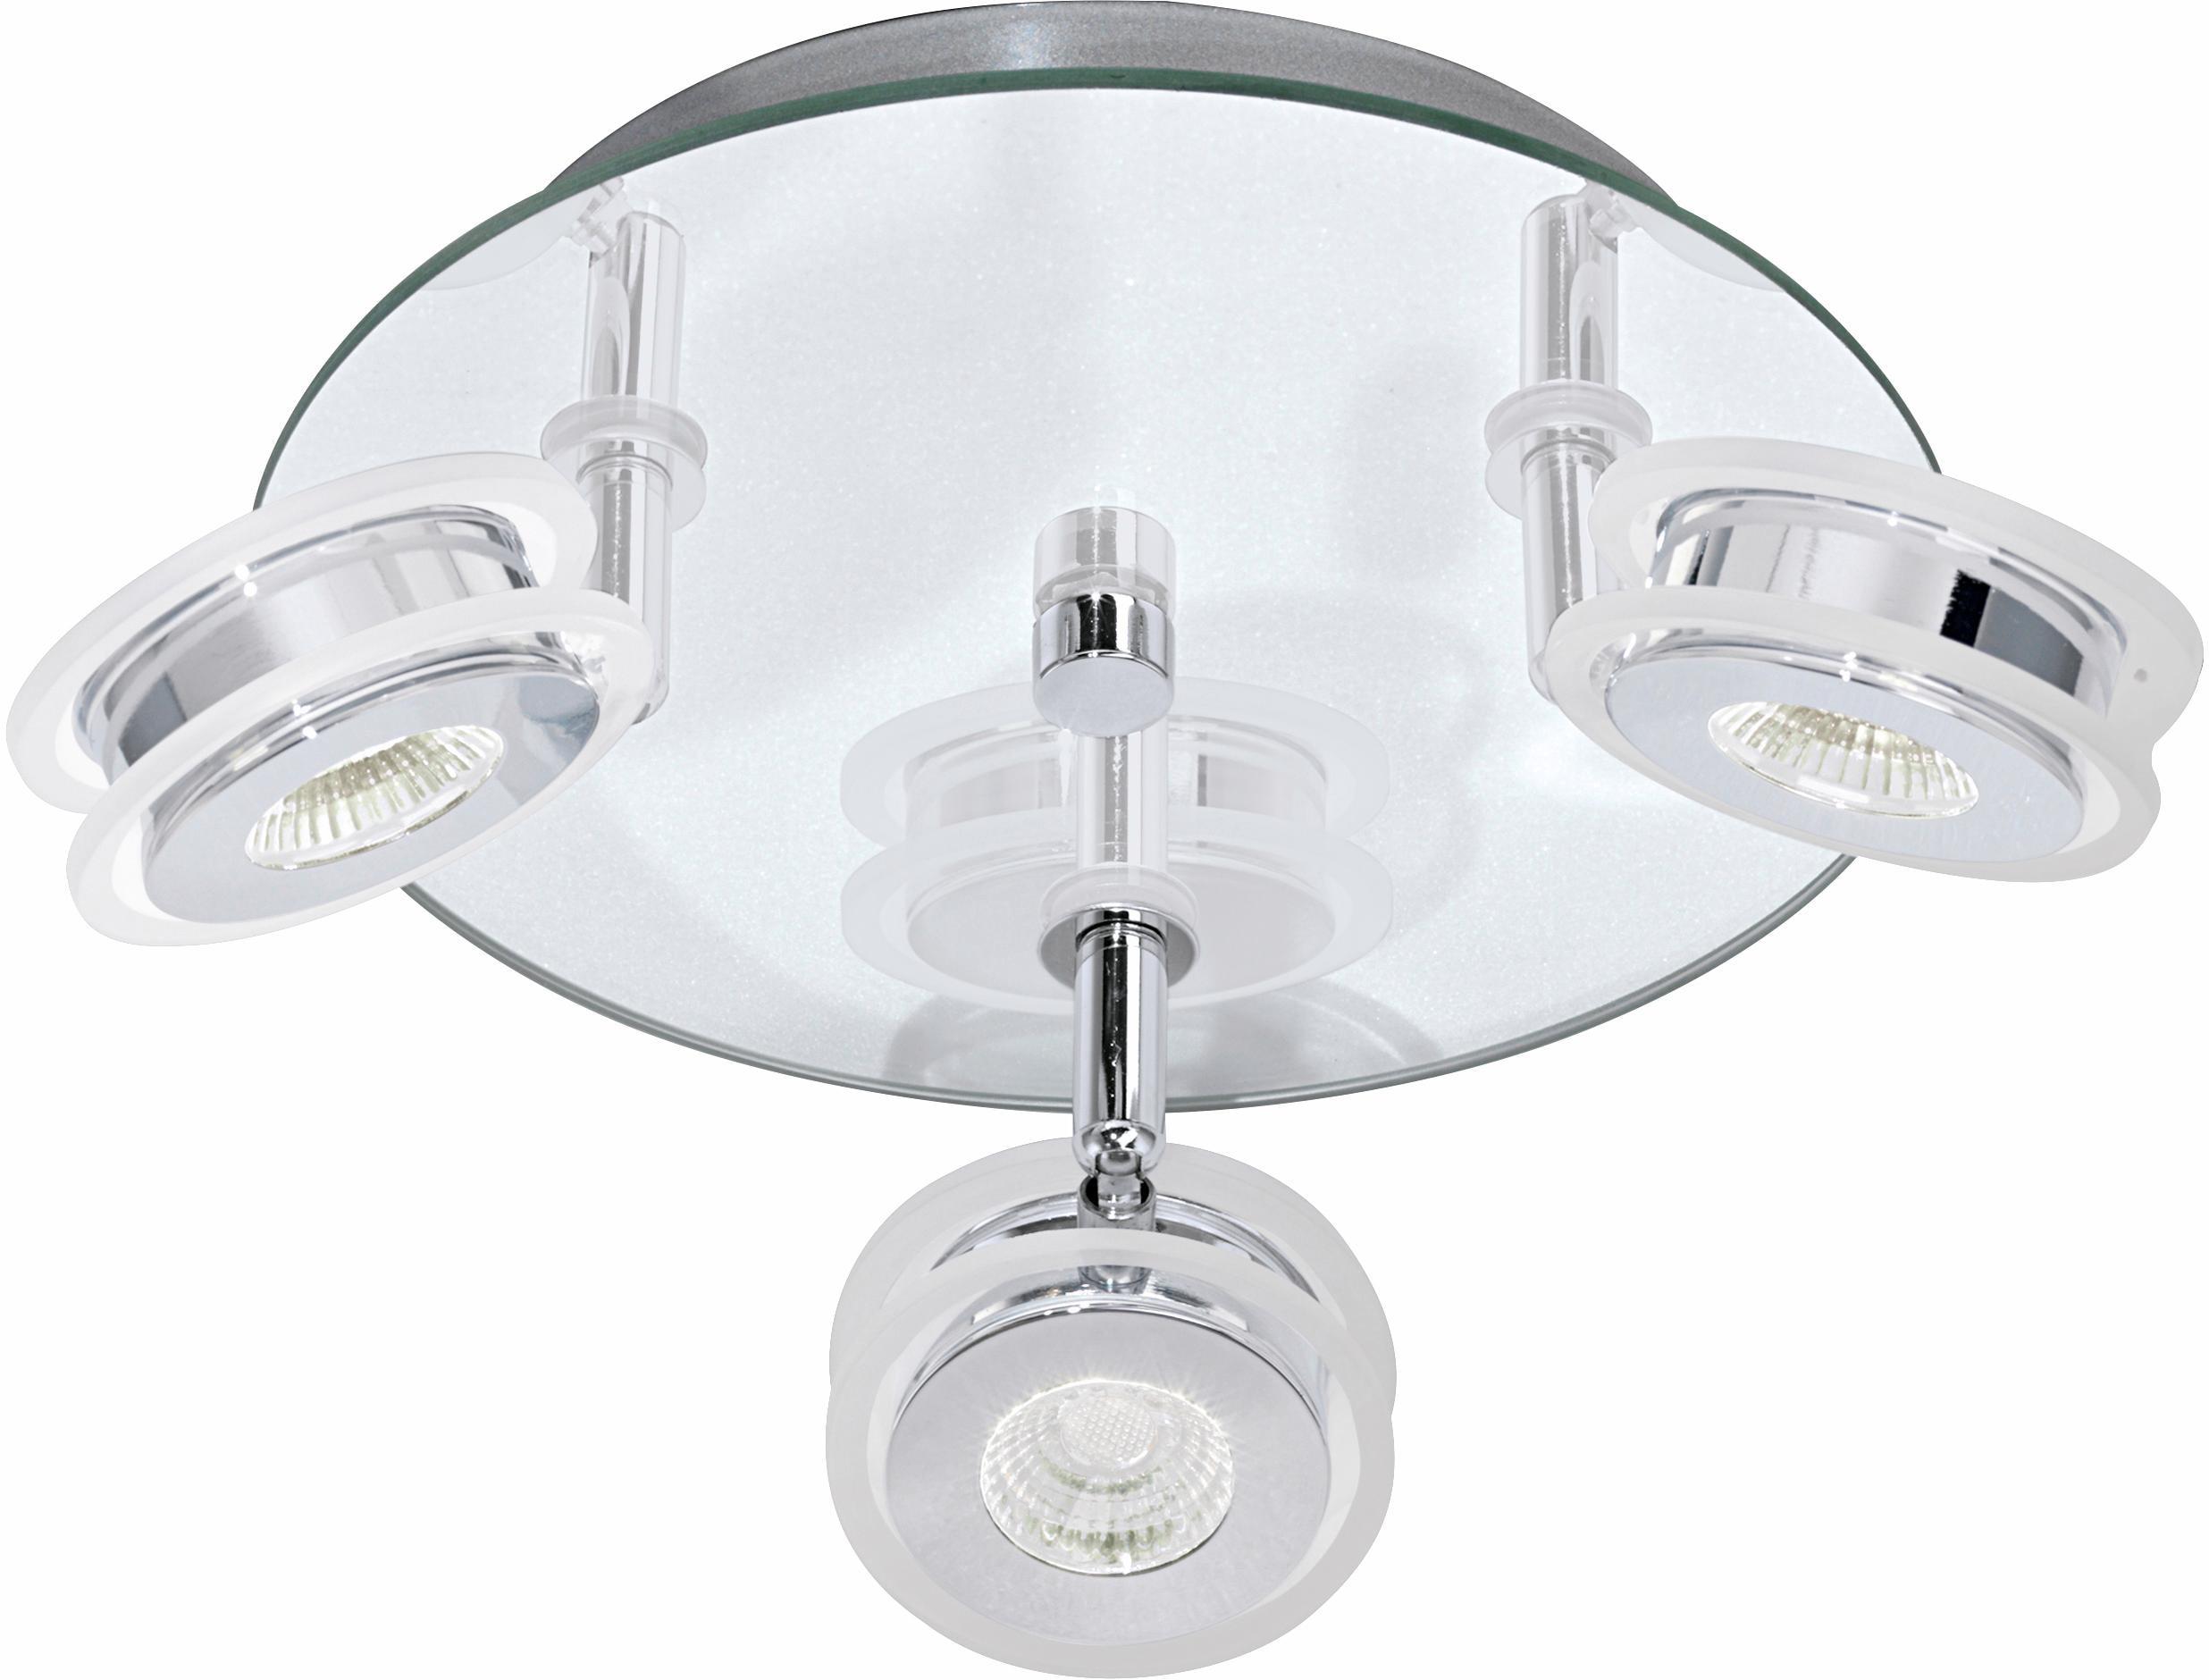 EGLO LED Deckenstrahler AGUEDA, LED-Board, Warmweiß, LED Deckenleuchte, LED Deckenlampe